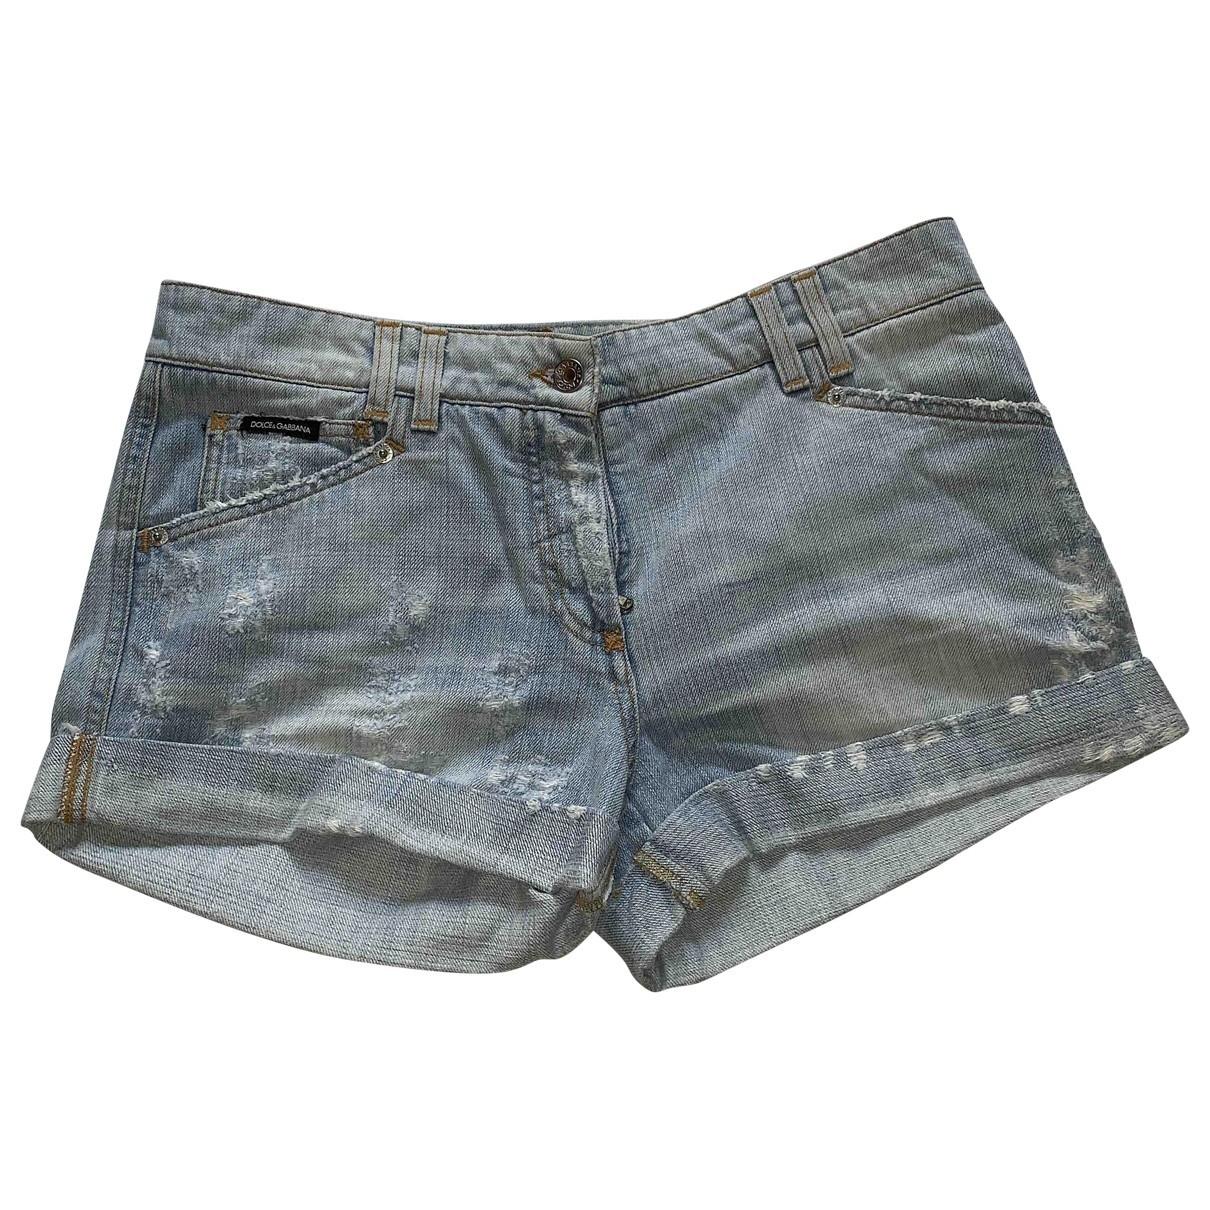 Dolce & Gabbana \N Blue Denim - Jeans Shorts for Women 44 IT